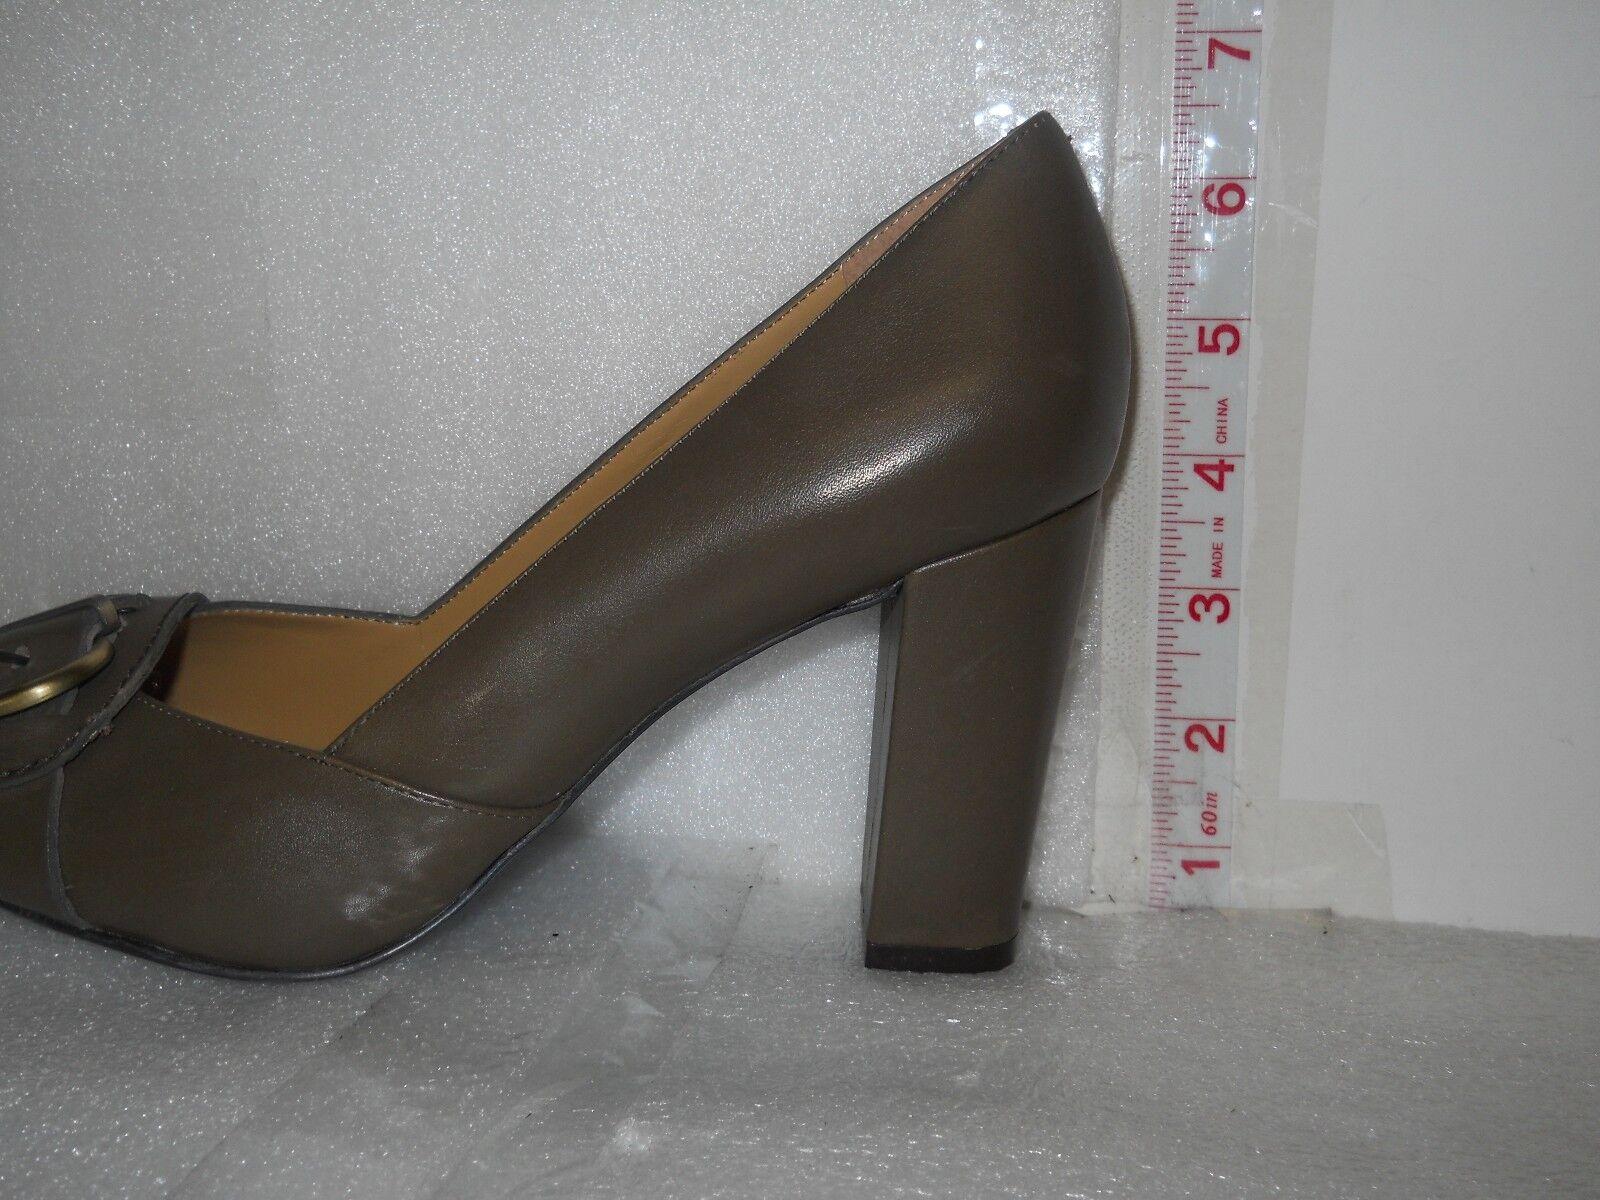 Circa Joan & David NEU Damenschuhe Found It Olive Green Open Toe Heels 8 M Schuhes